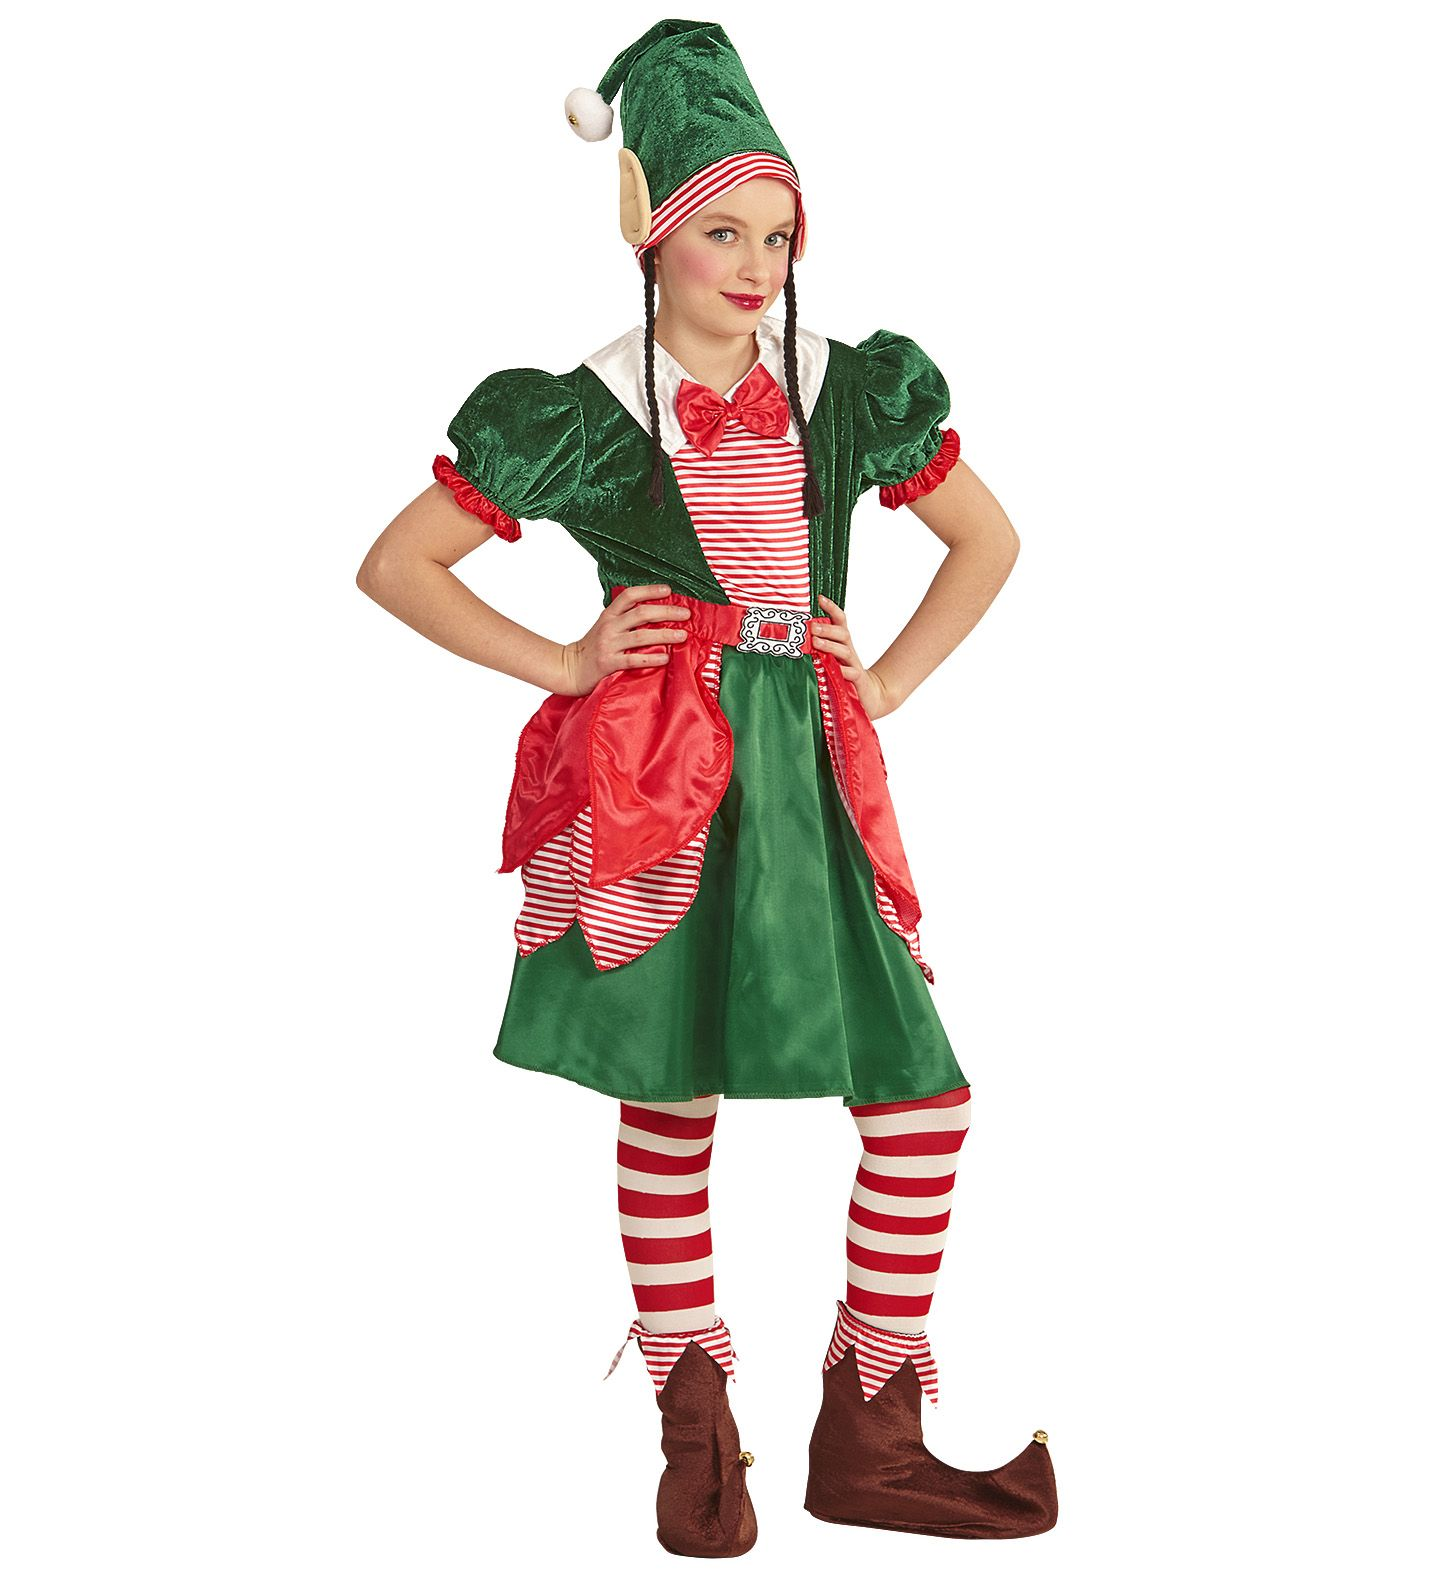 Stroj Elfka Elfa Elfki Pomocniczka Mikolaja 140 7276235686 Oficjalne Archiwum Allegro Santa S Little Helper Widmann Ronald Mcdonald